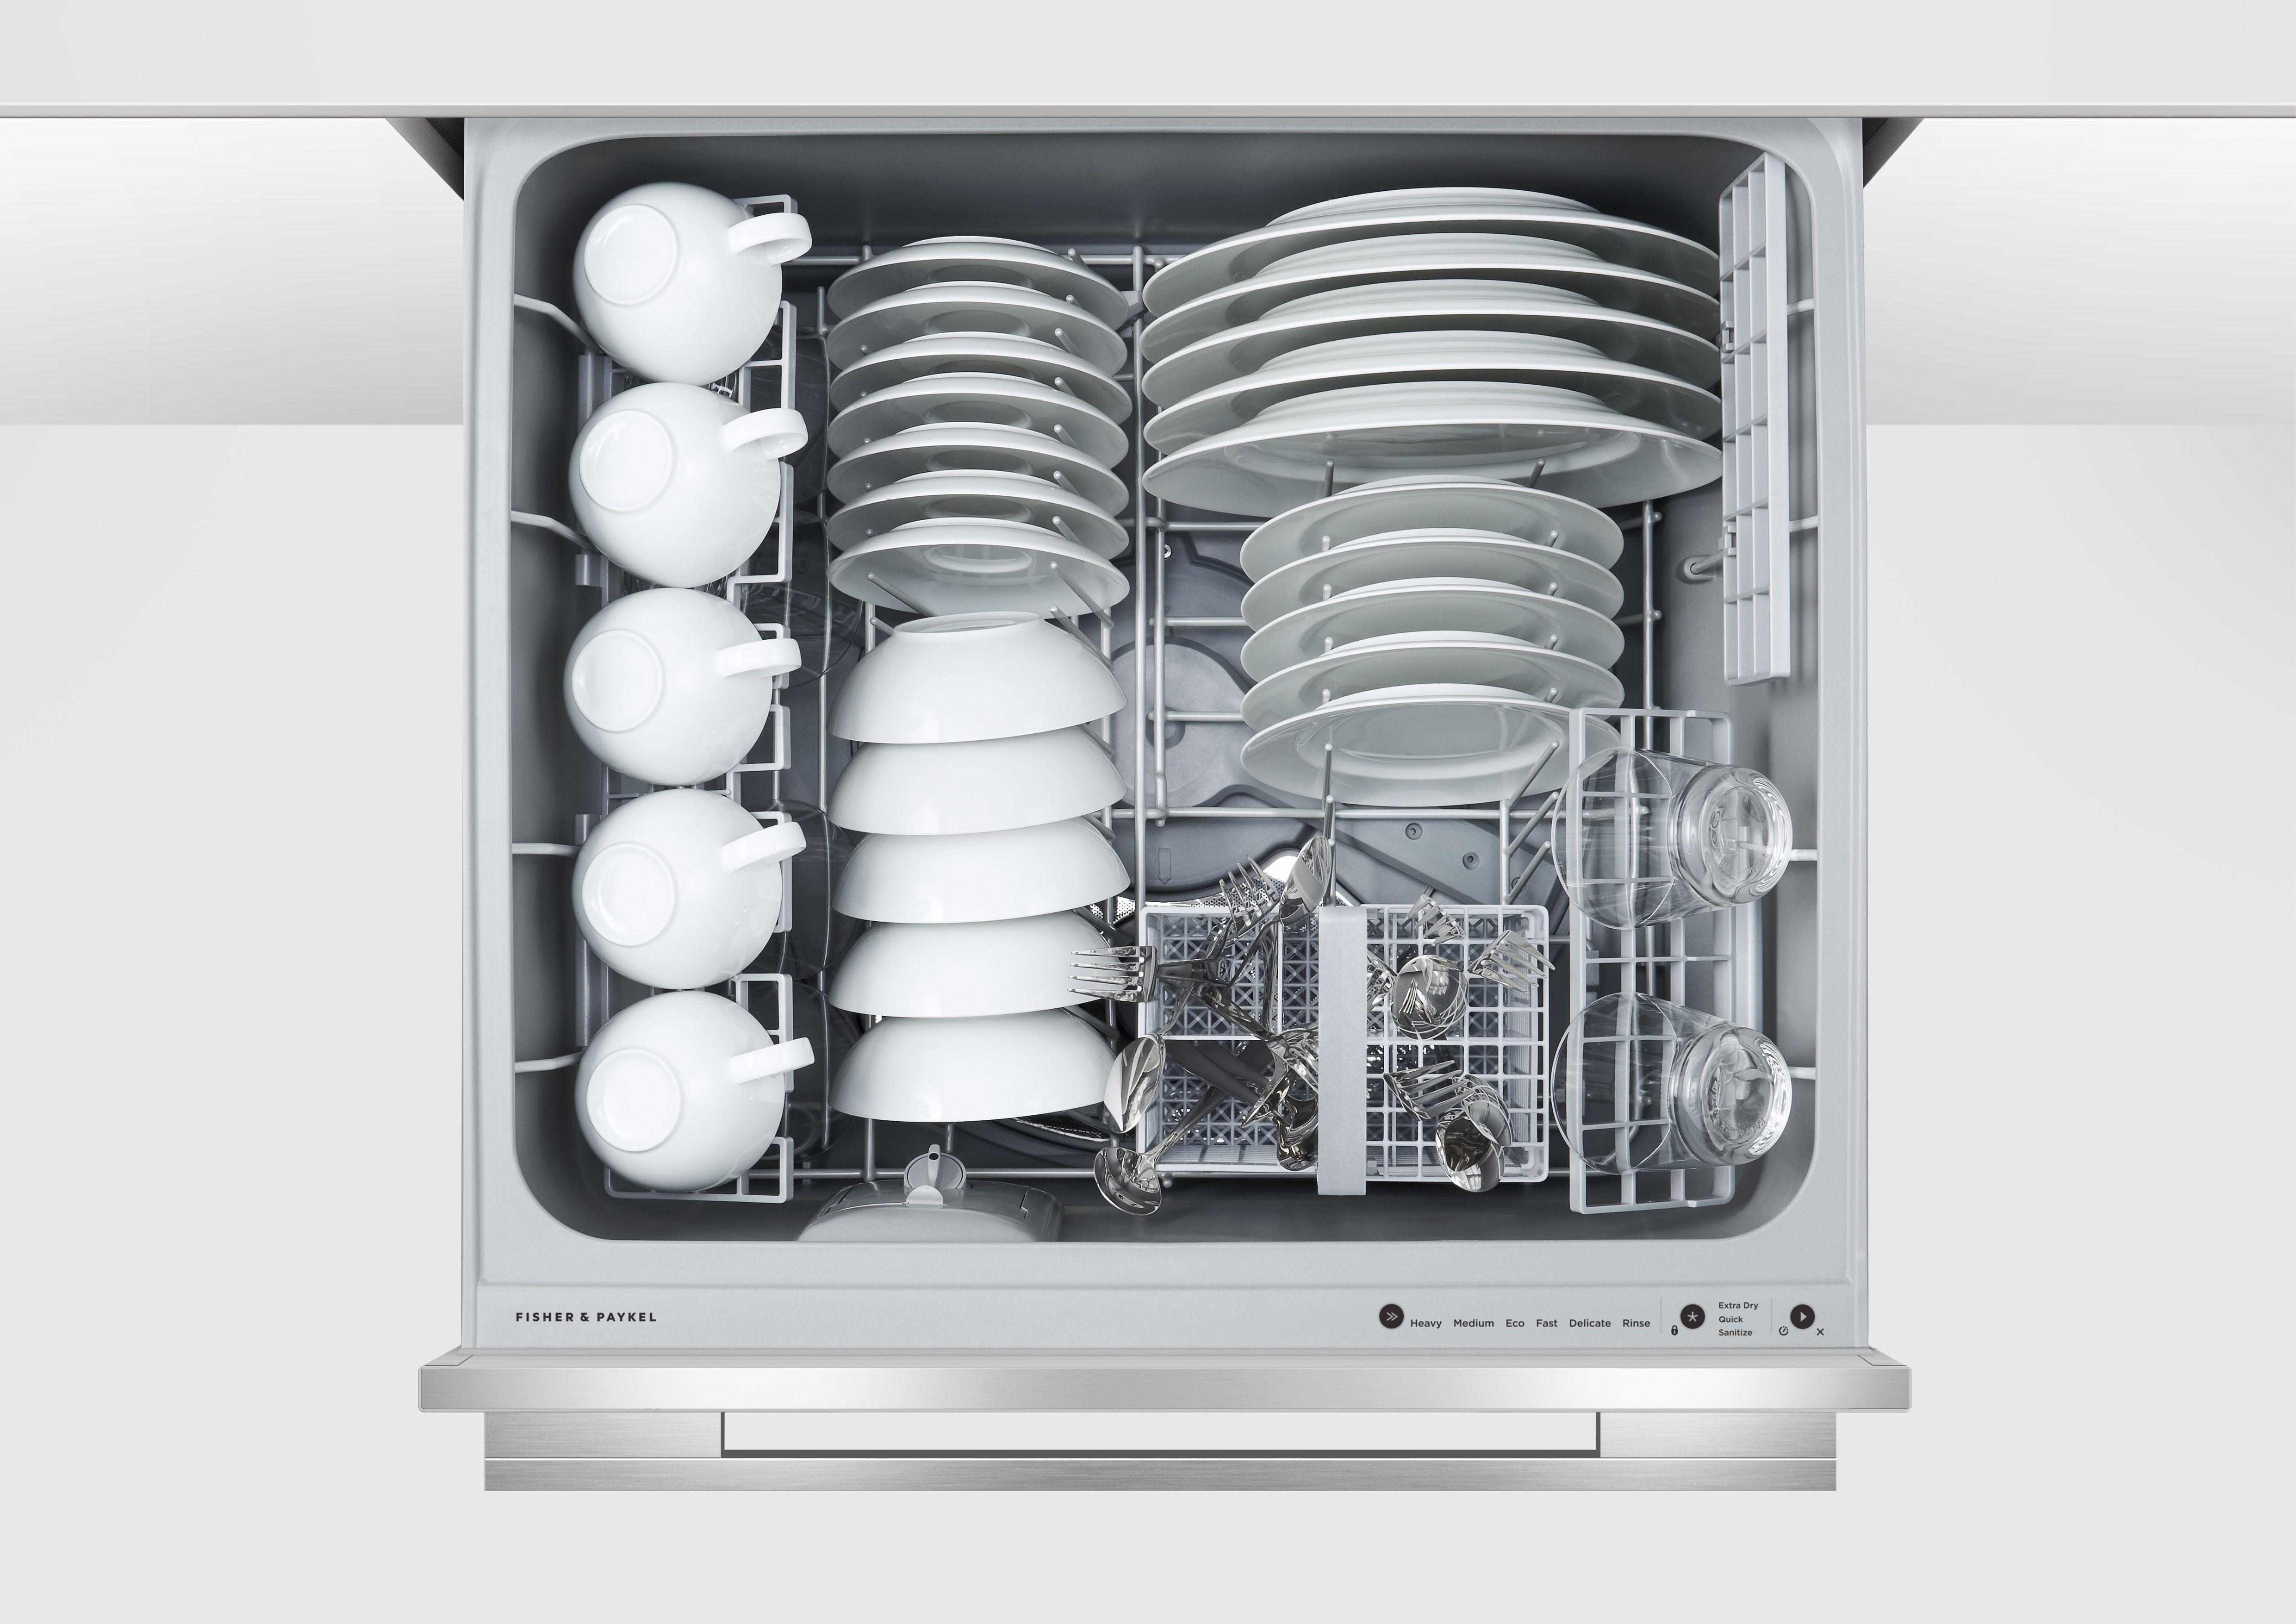 drawer wikipedia an open single for dishwasher loading wiki